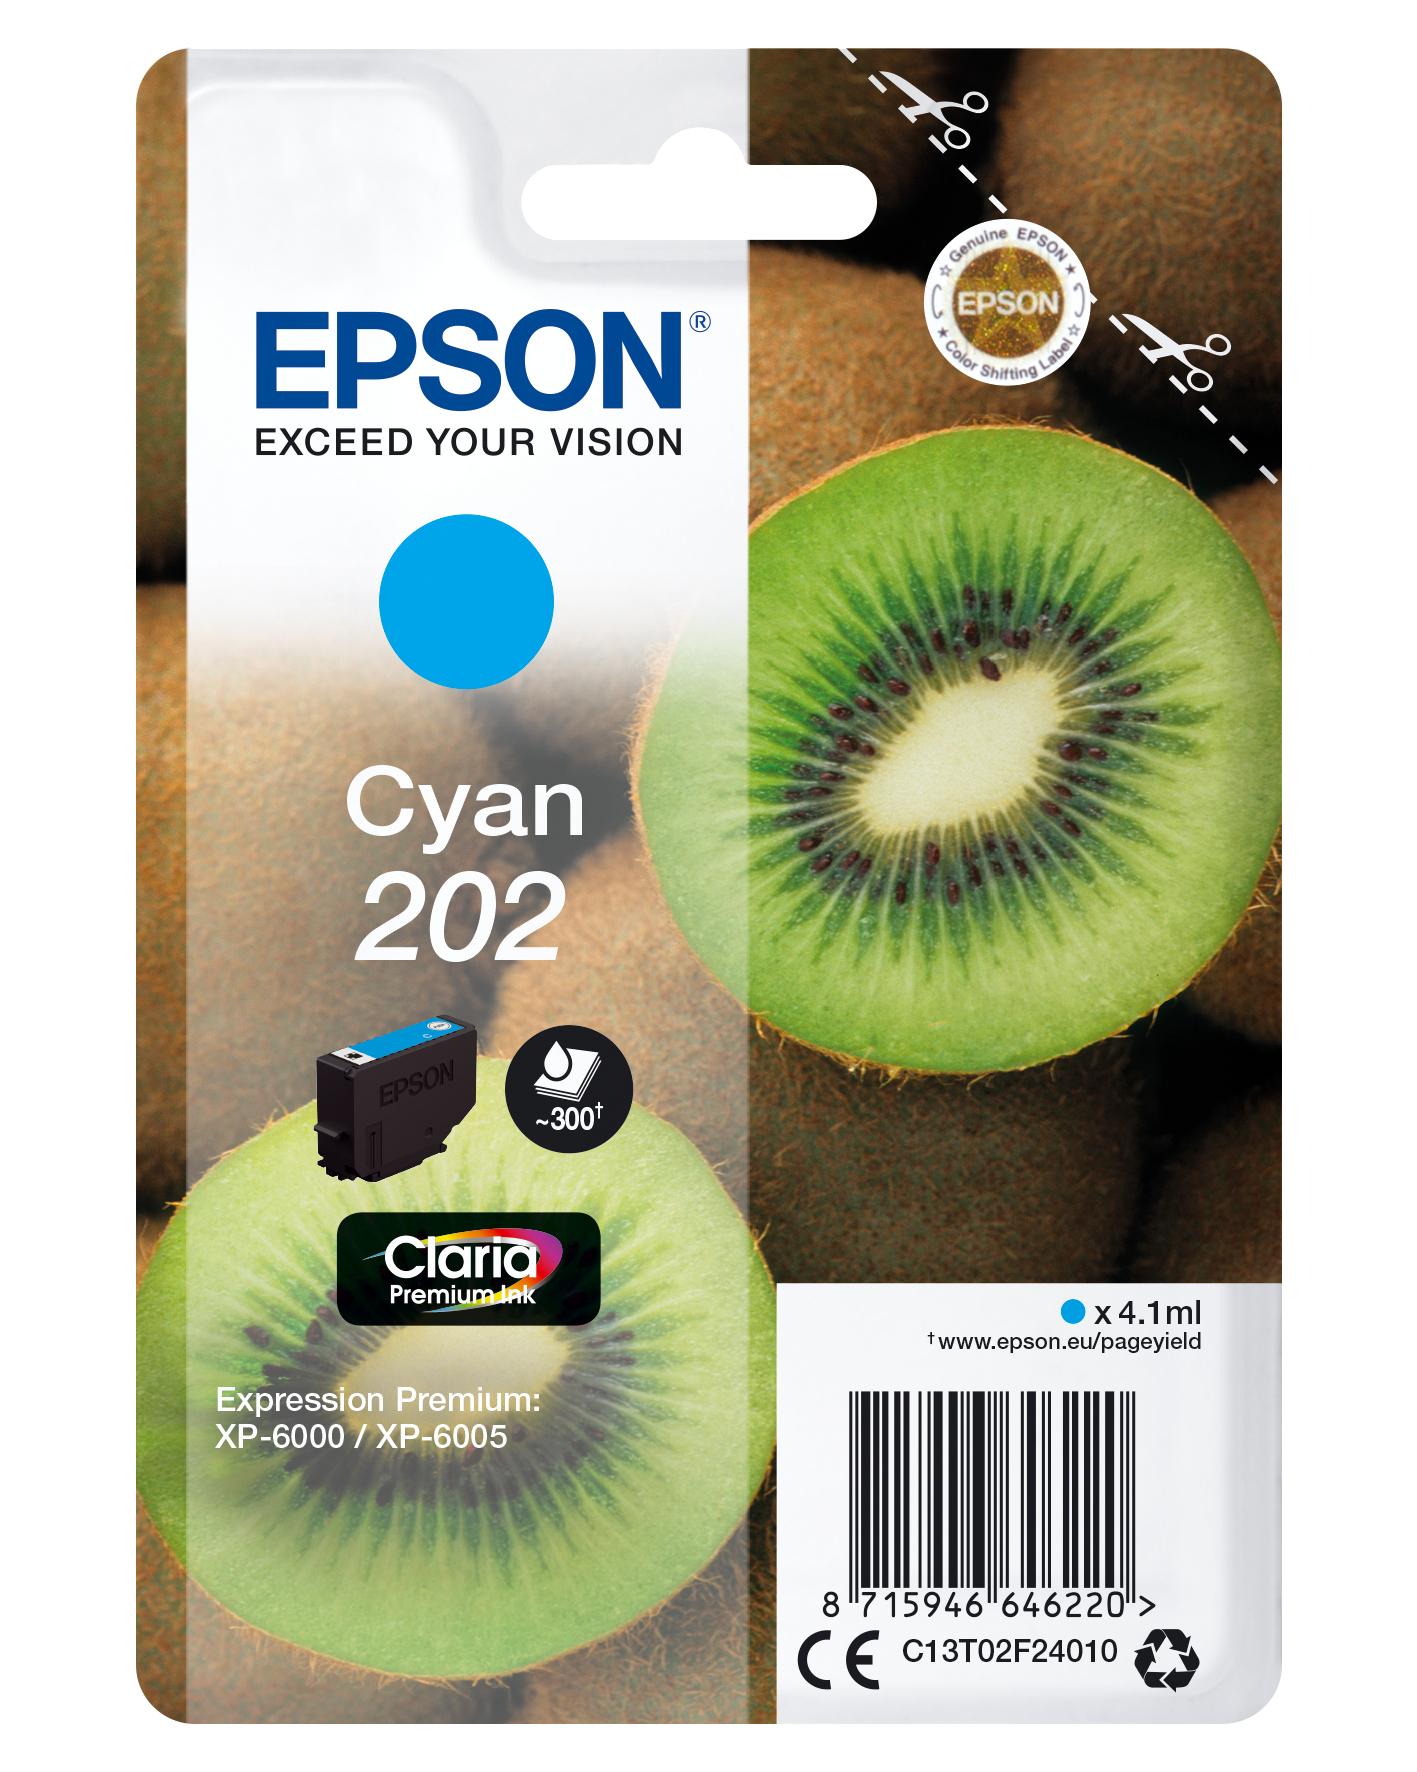 Epson-C13T02F24020-Kiwi-Singlepack-Cyan-202-Claria-Premium-Ink-Original thumbnail 2